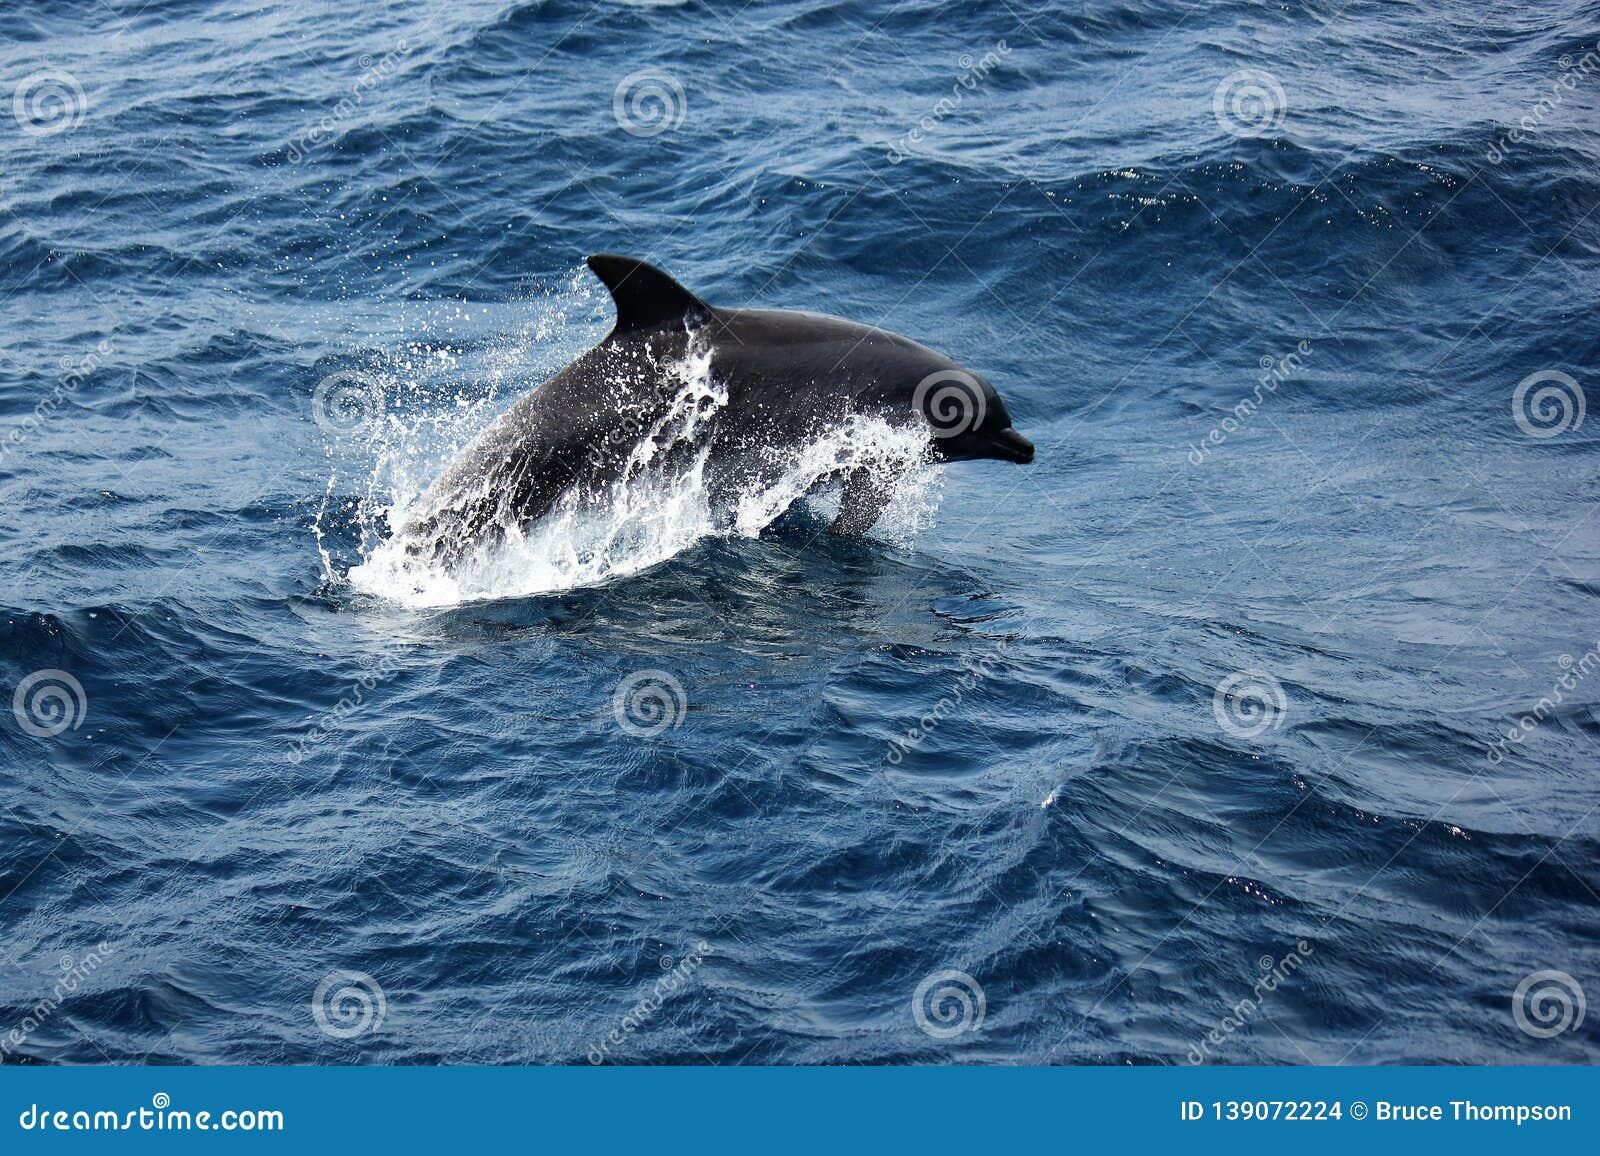 Bottle Nosed Dolphin breaching